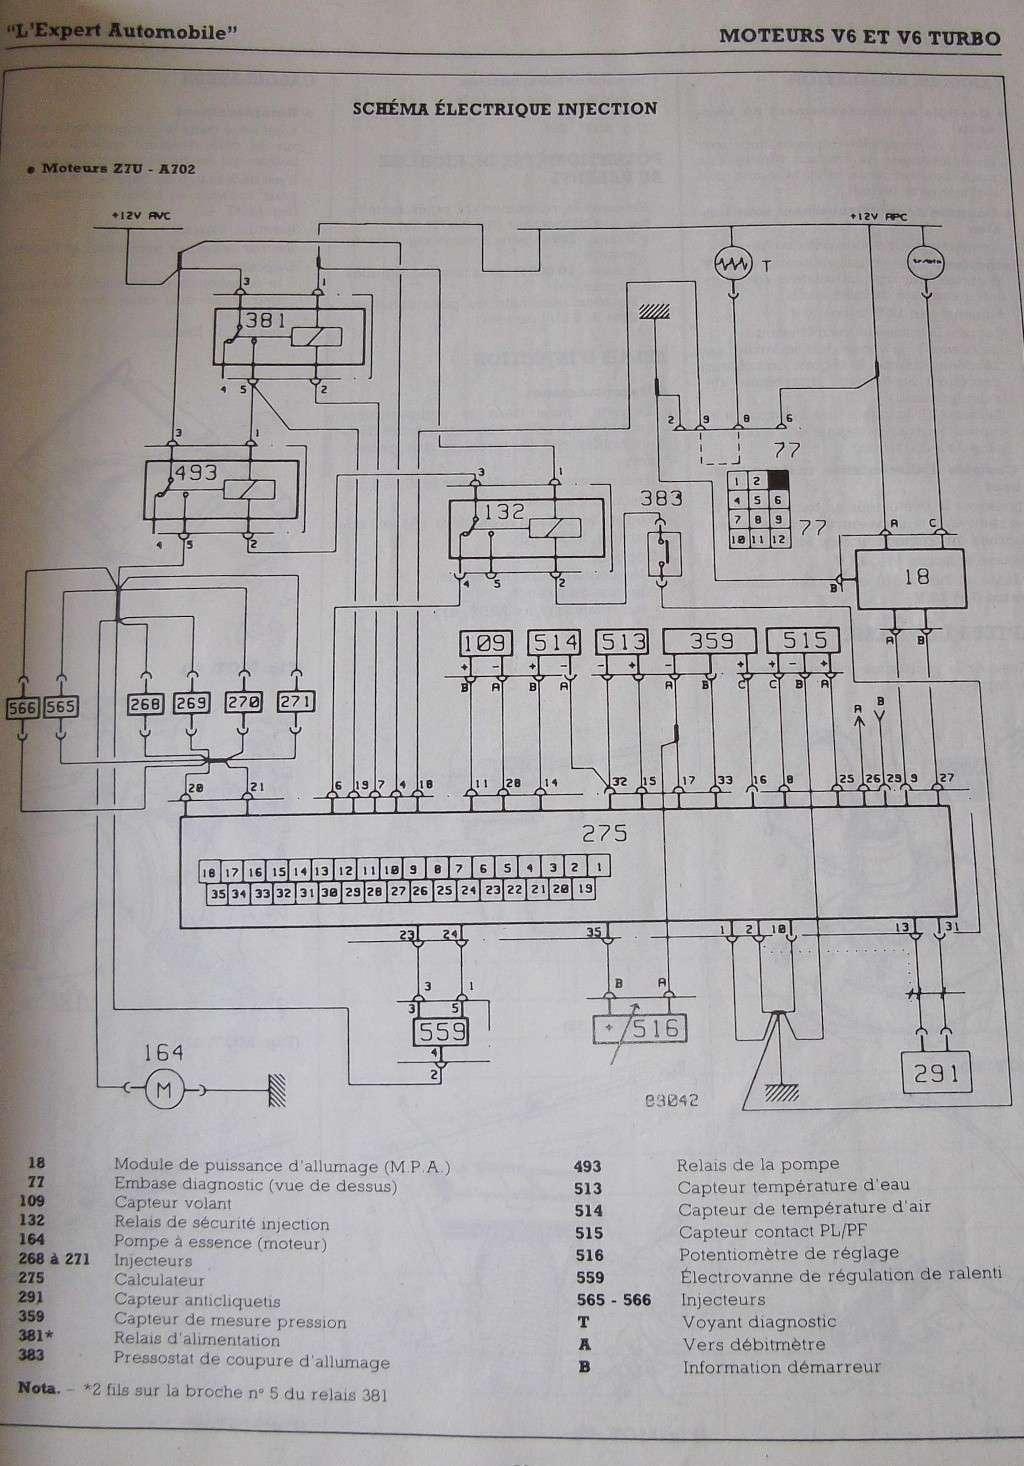 [RESOLU] Panne alimentation pompe à essence - Page 2 Imgp2410